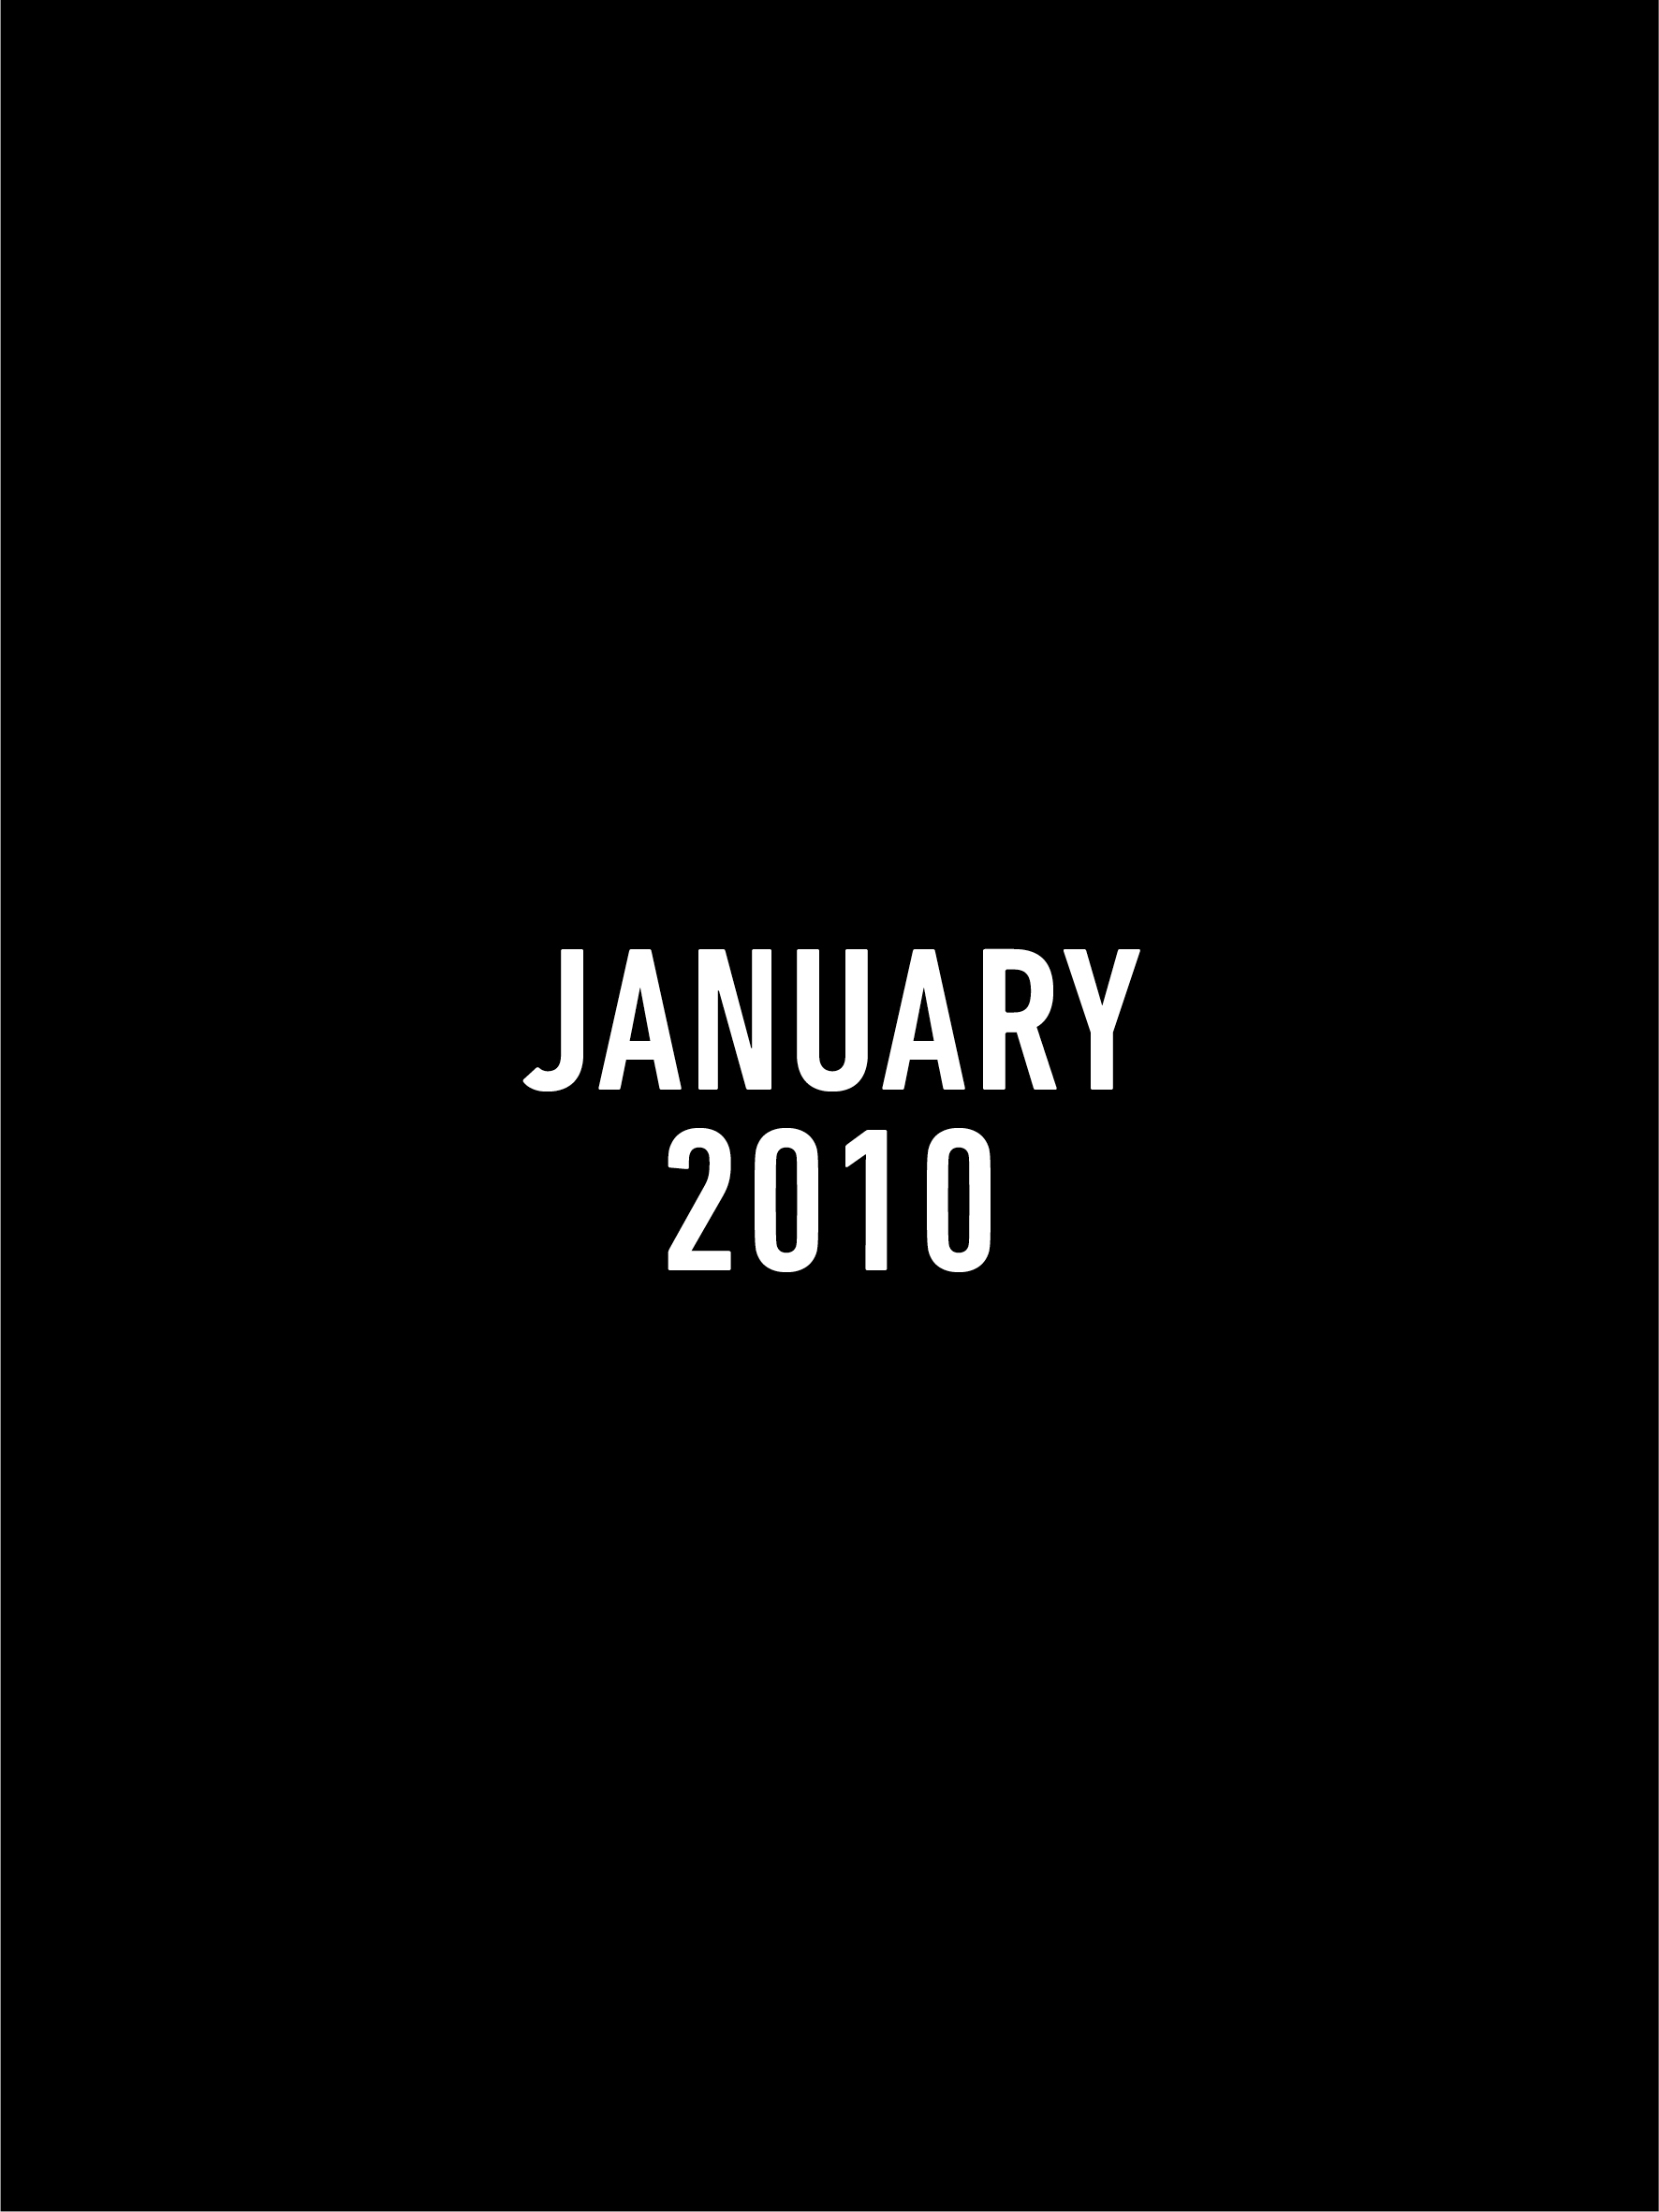 2010 monthly.jpg